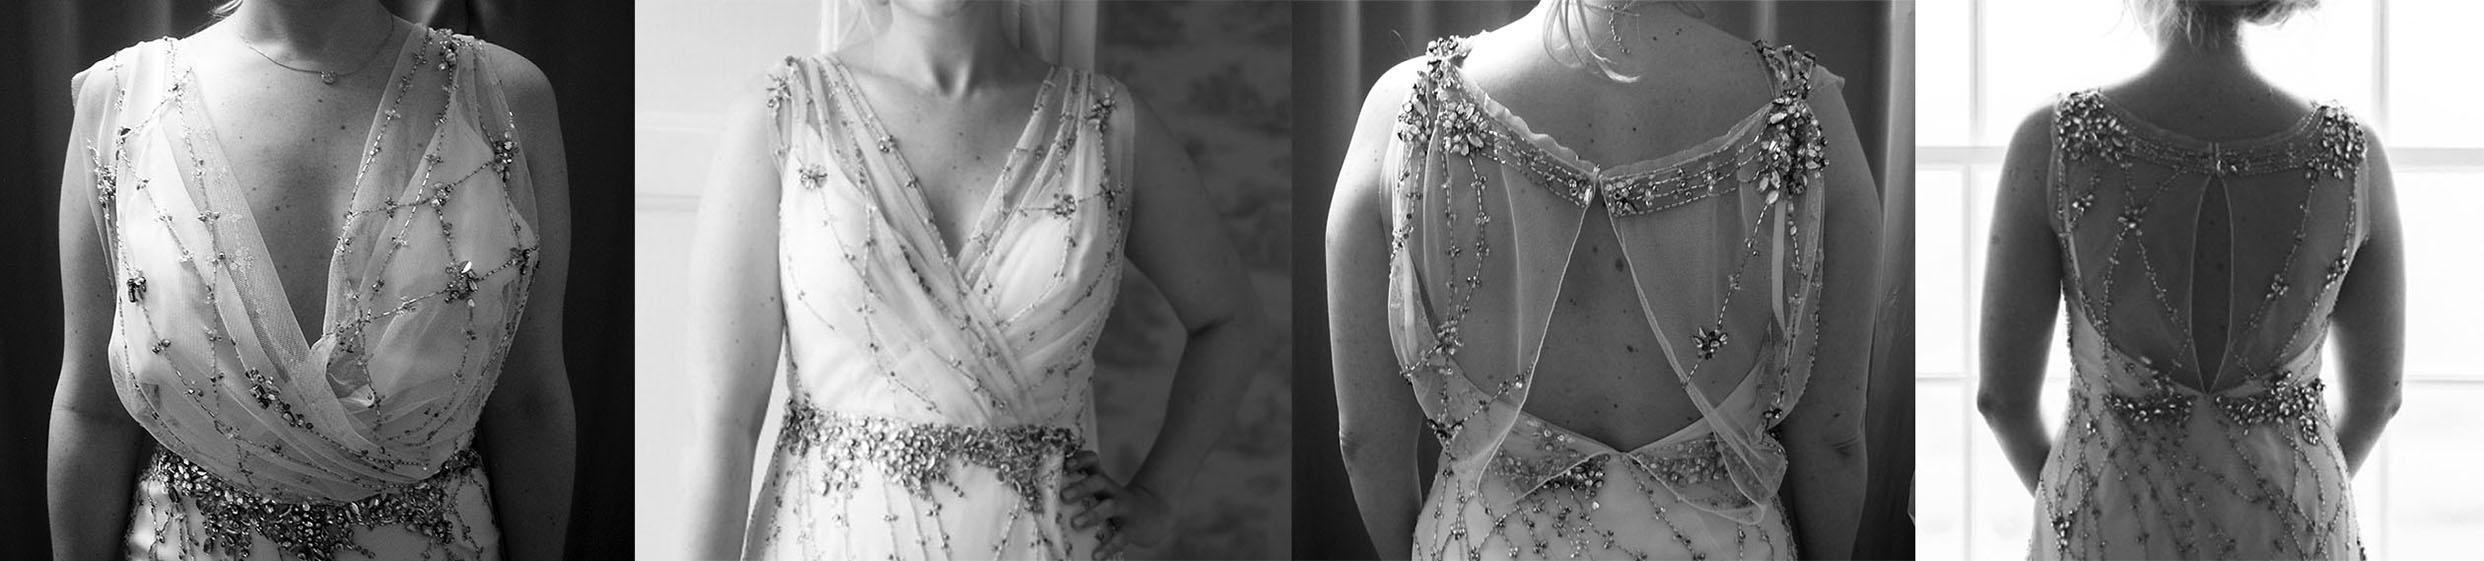 Wedding Dress Alterations Near Me.Bridal Dress Alterations High Quality Bridal Alteration